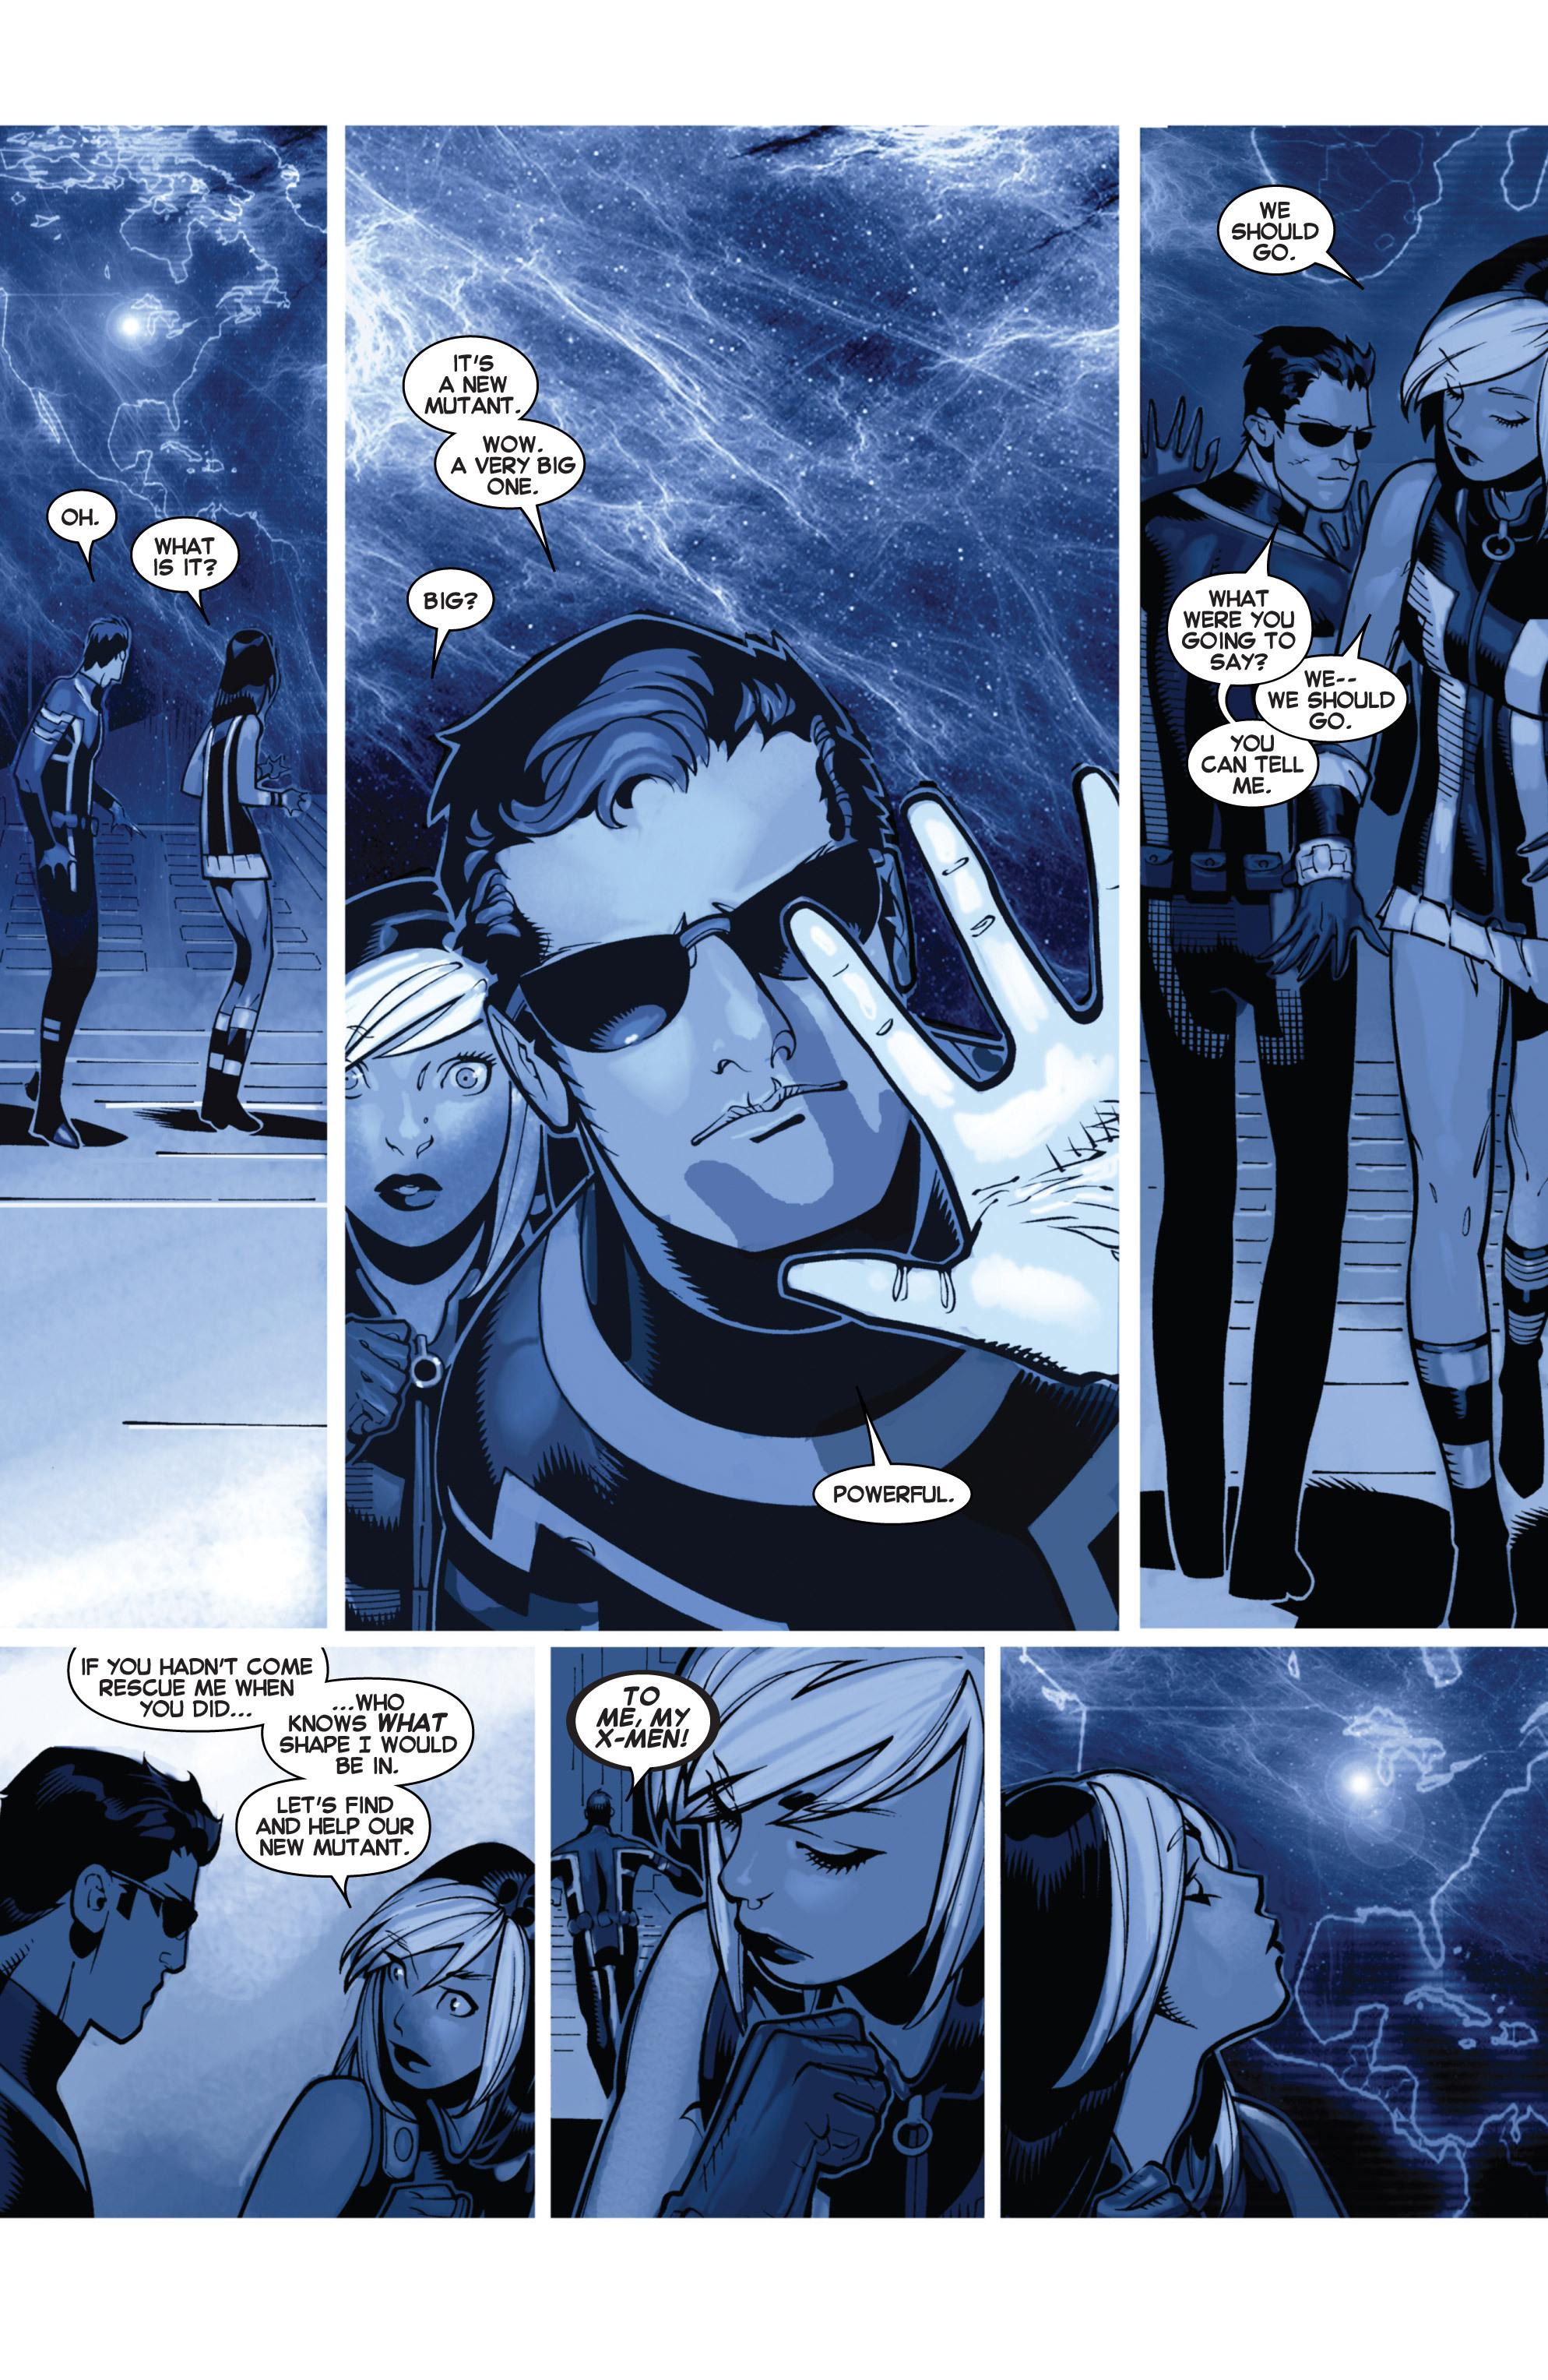 Read online Uncanny X-Men (2013) comic -  Issue # _TPB 4 - vs. S.H.I.E.L.D - 12